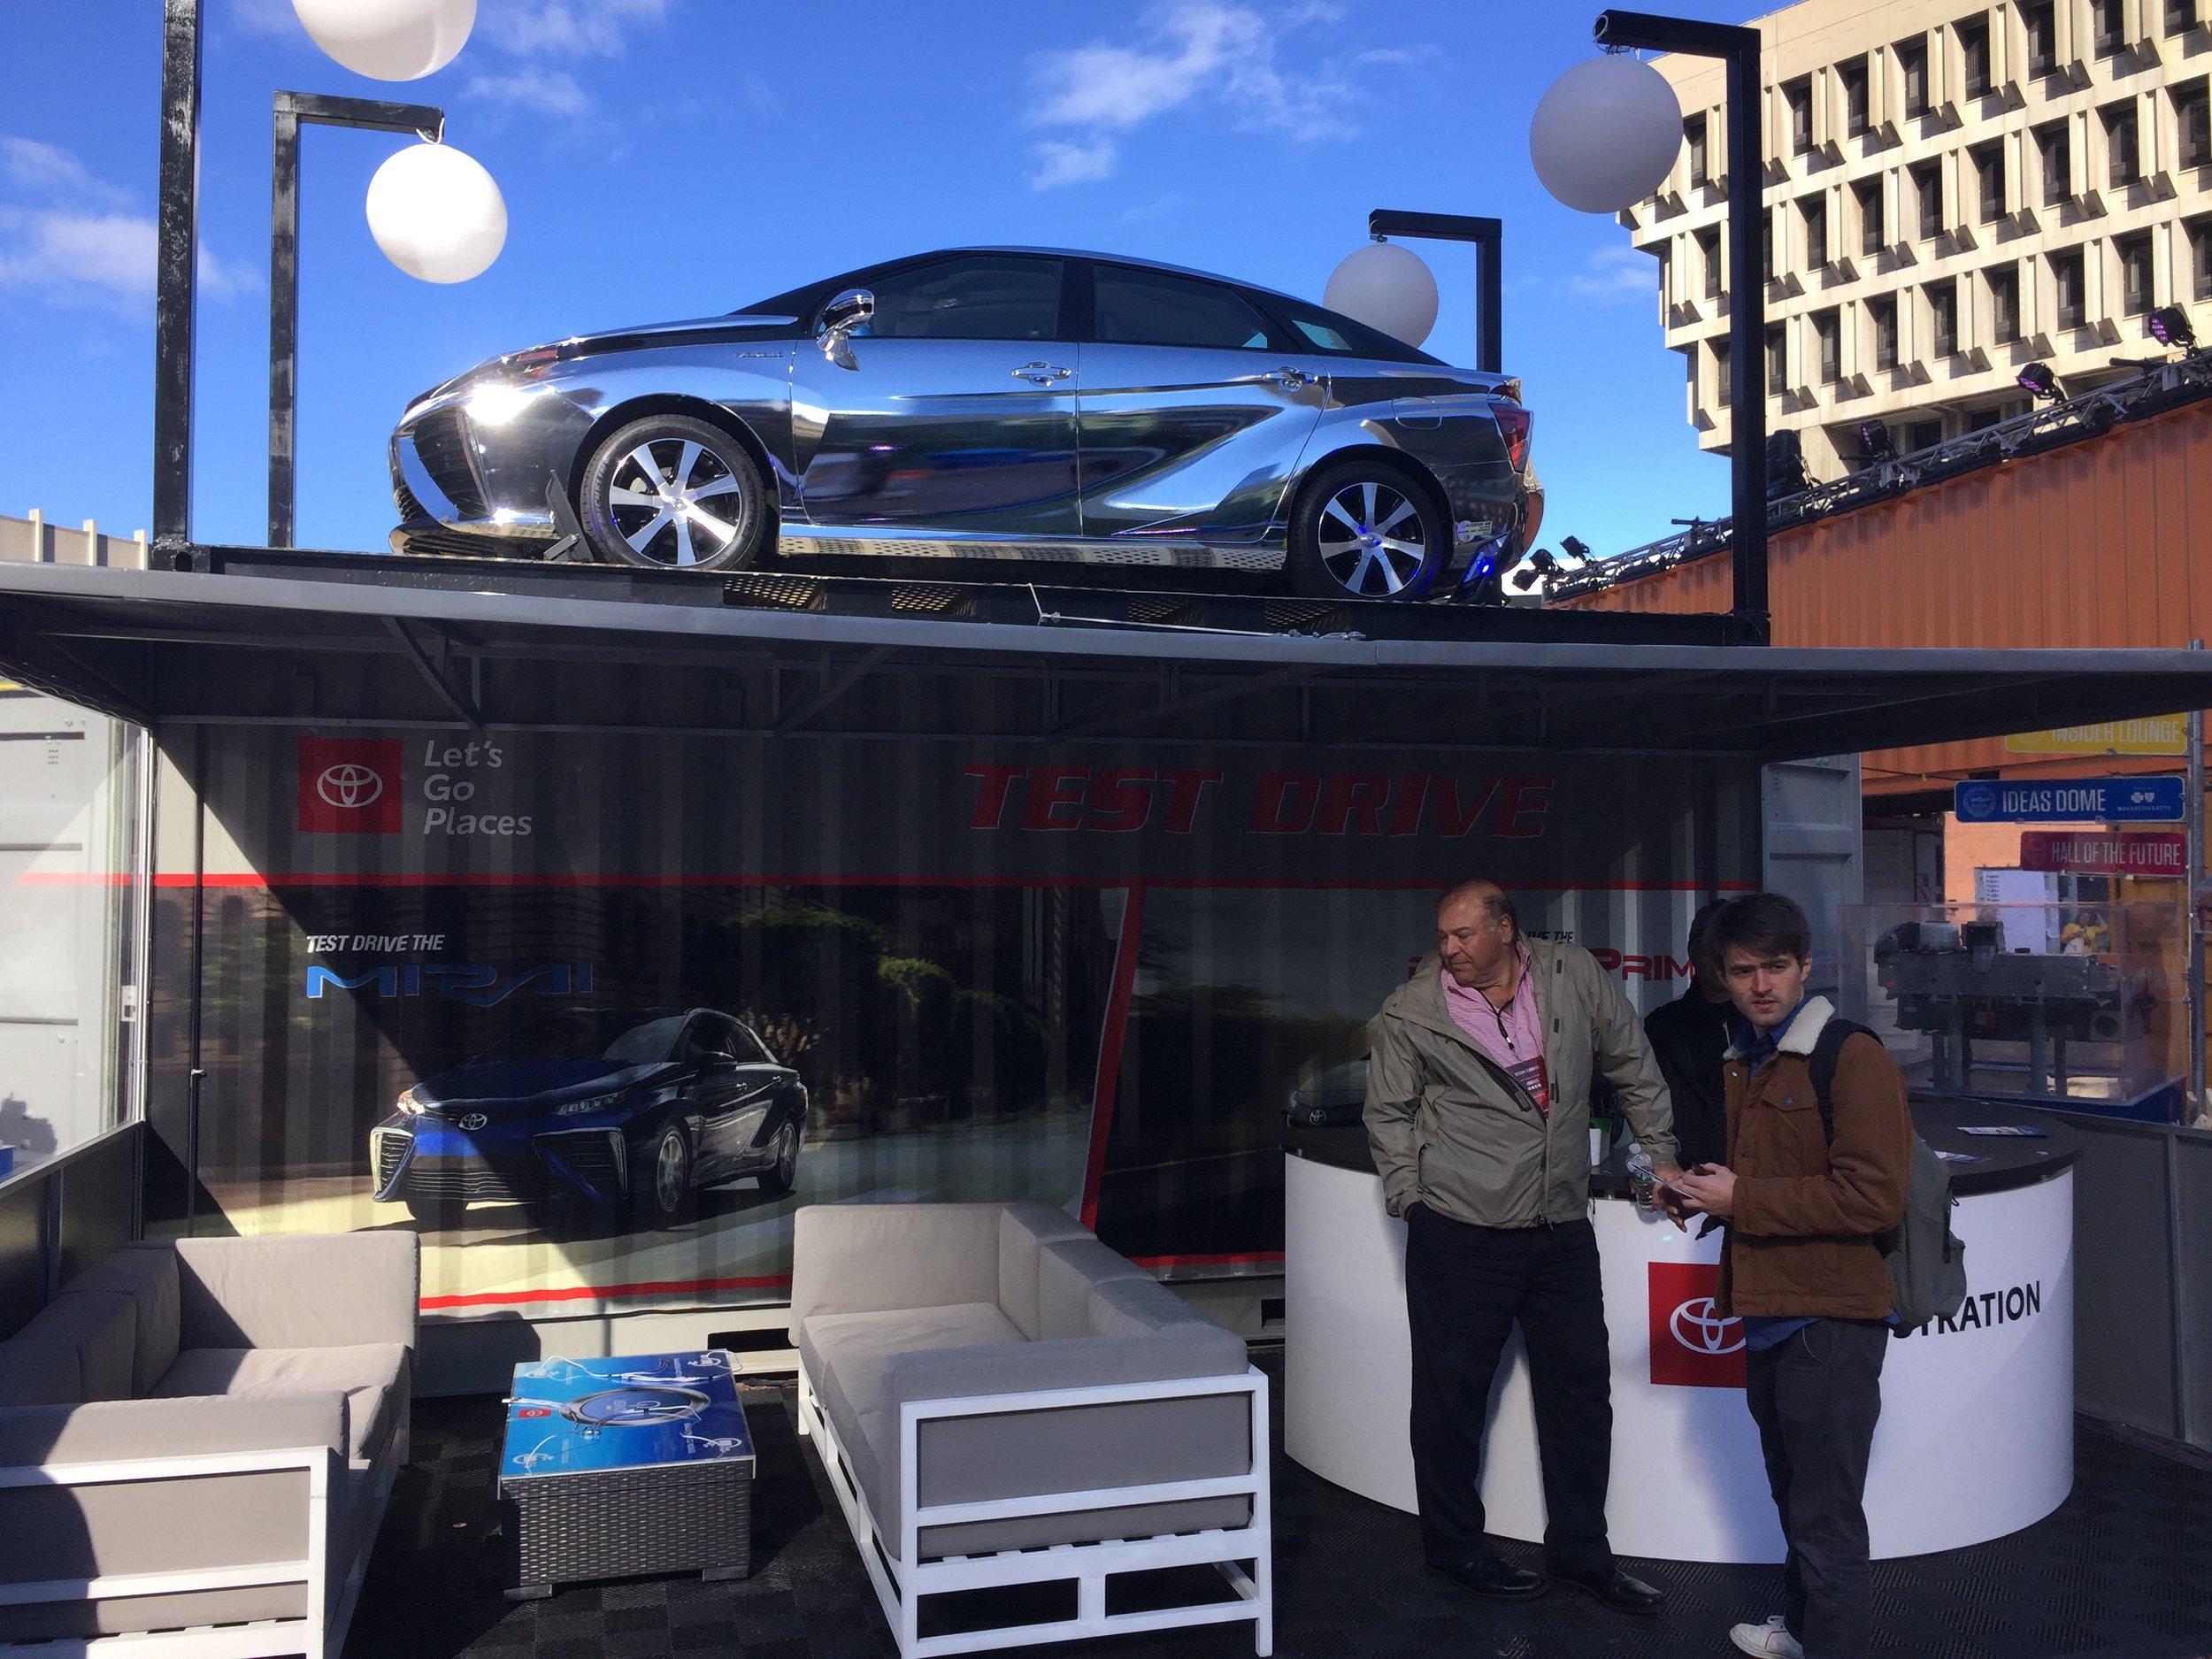 The Toyota Mirai lead generation lounge